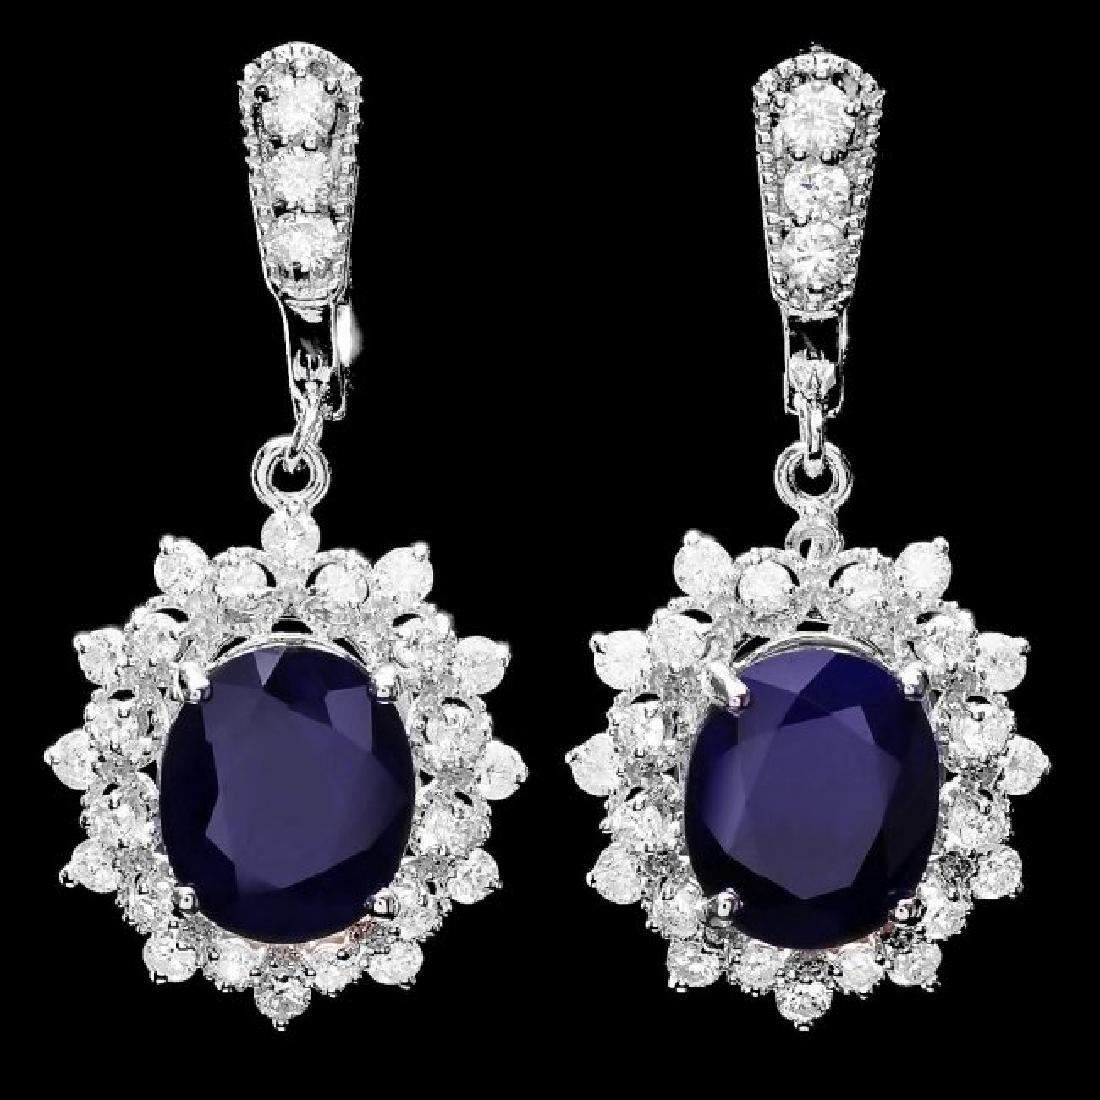 14k Gold 9ct Sapphire 1.90ct Diamond Earrings